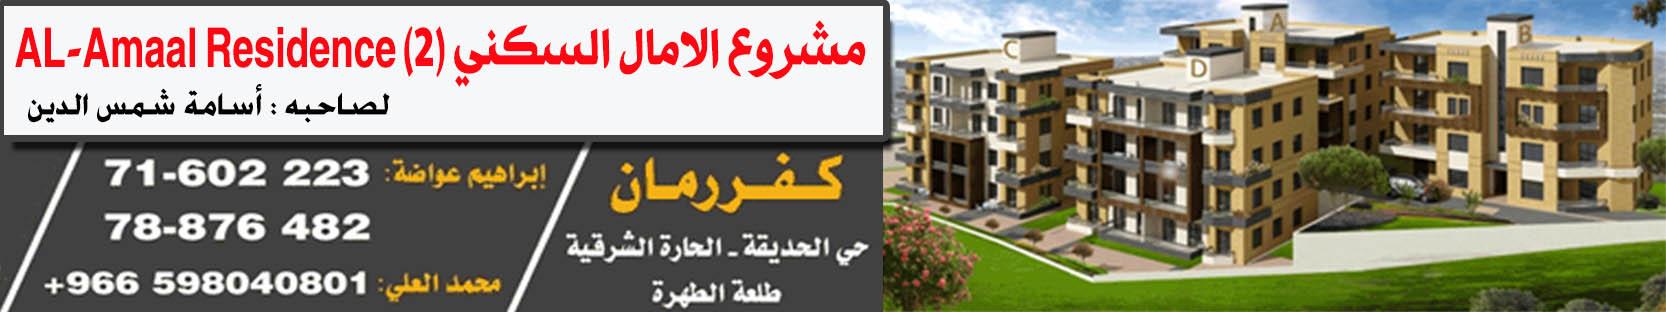 nabatieh.org/news.php?go=fullnews&newsid=10360